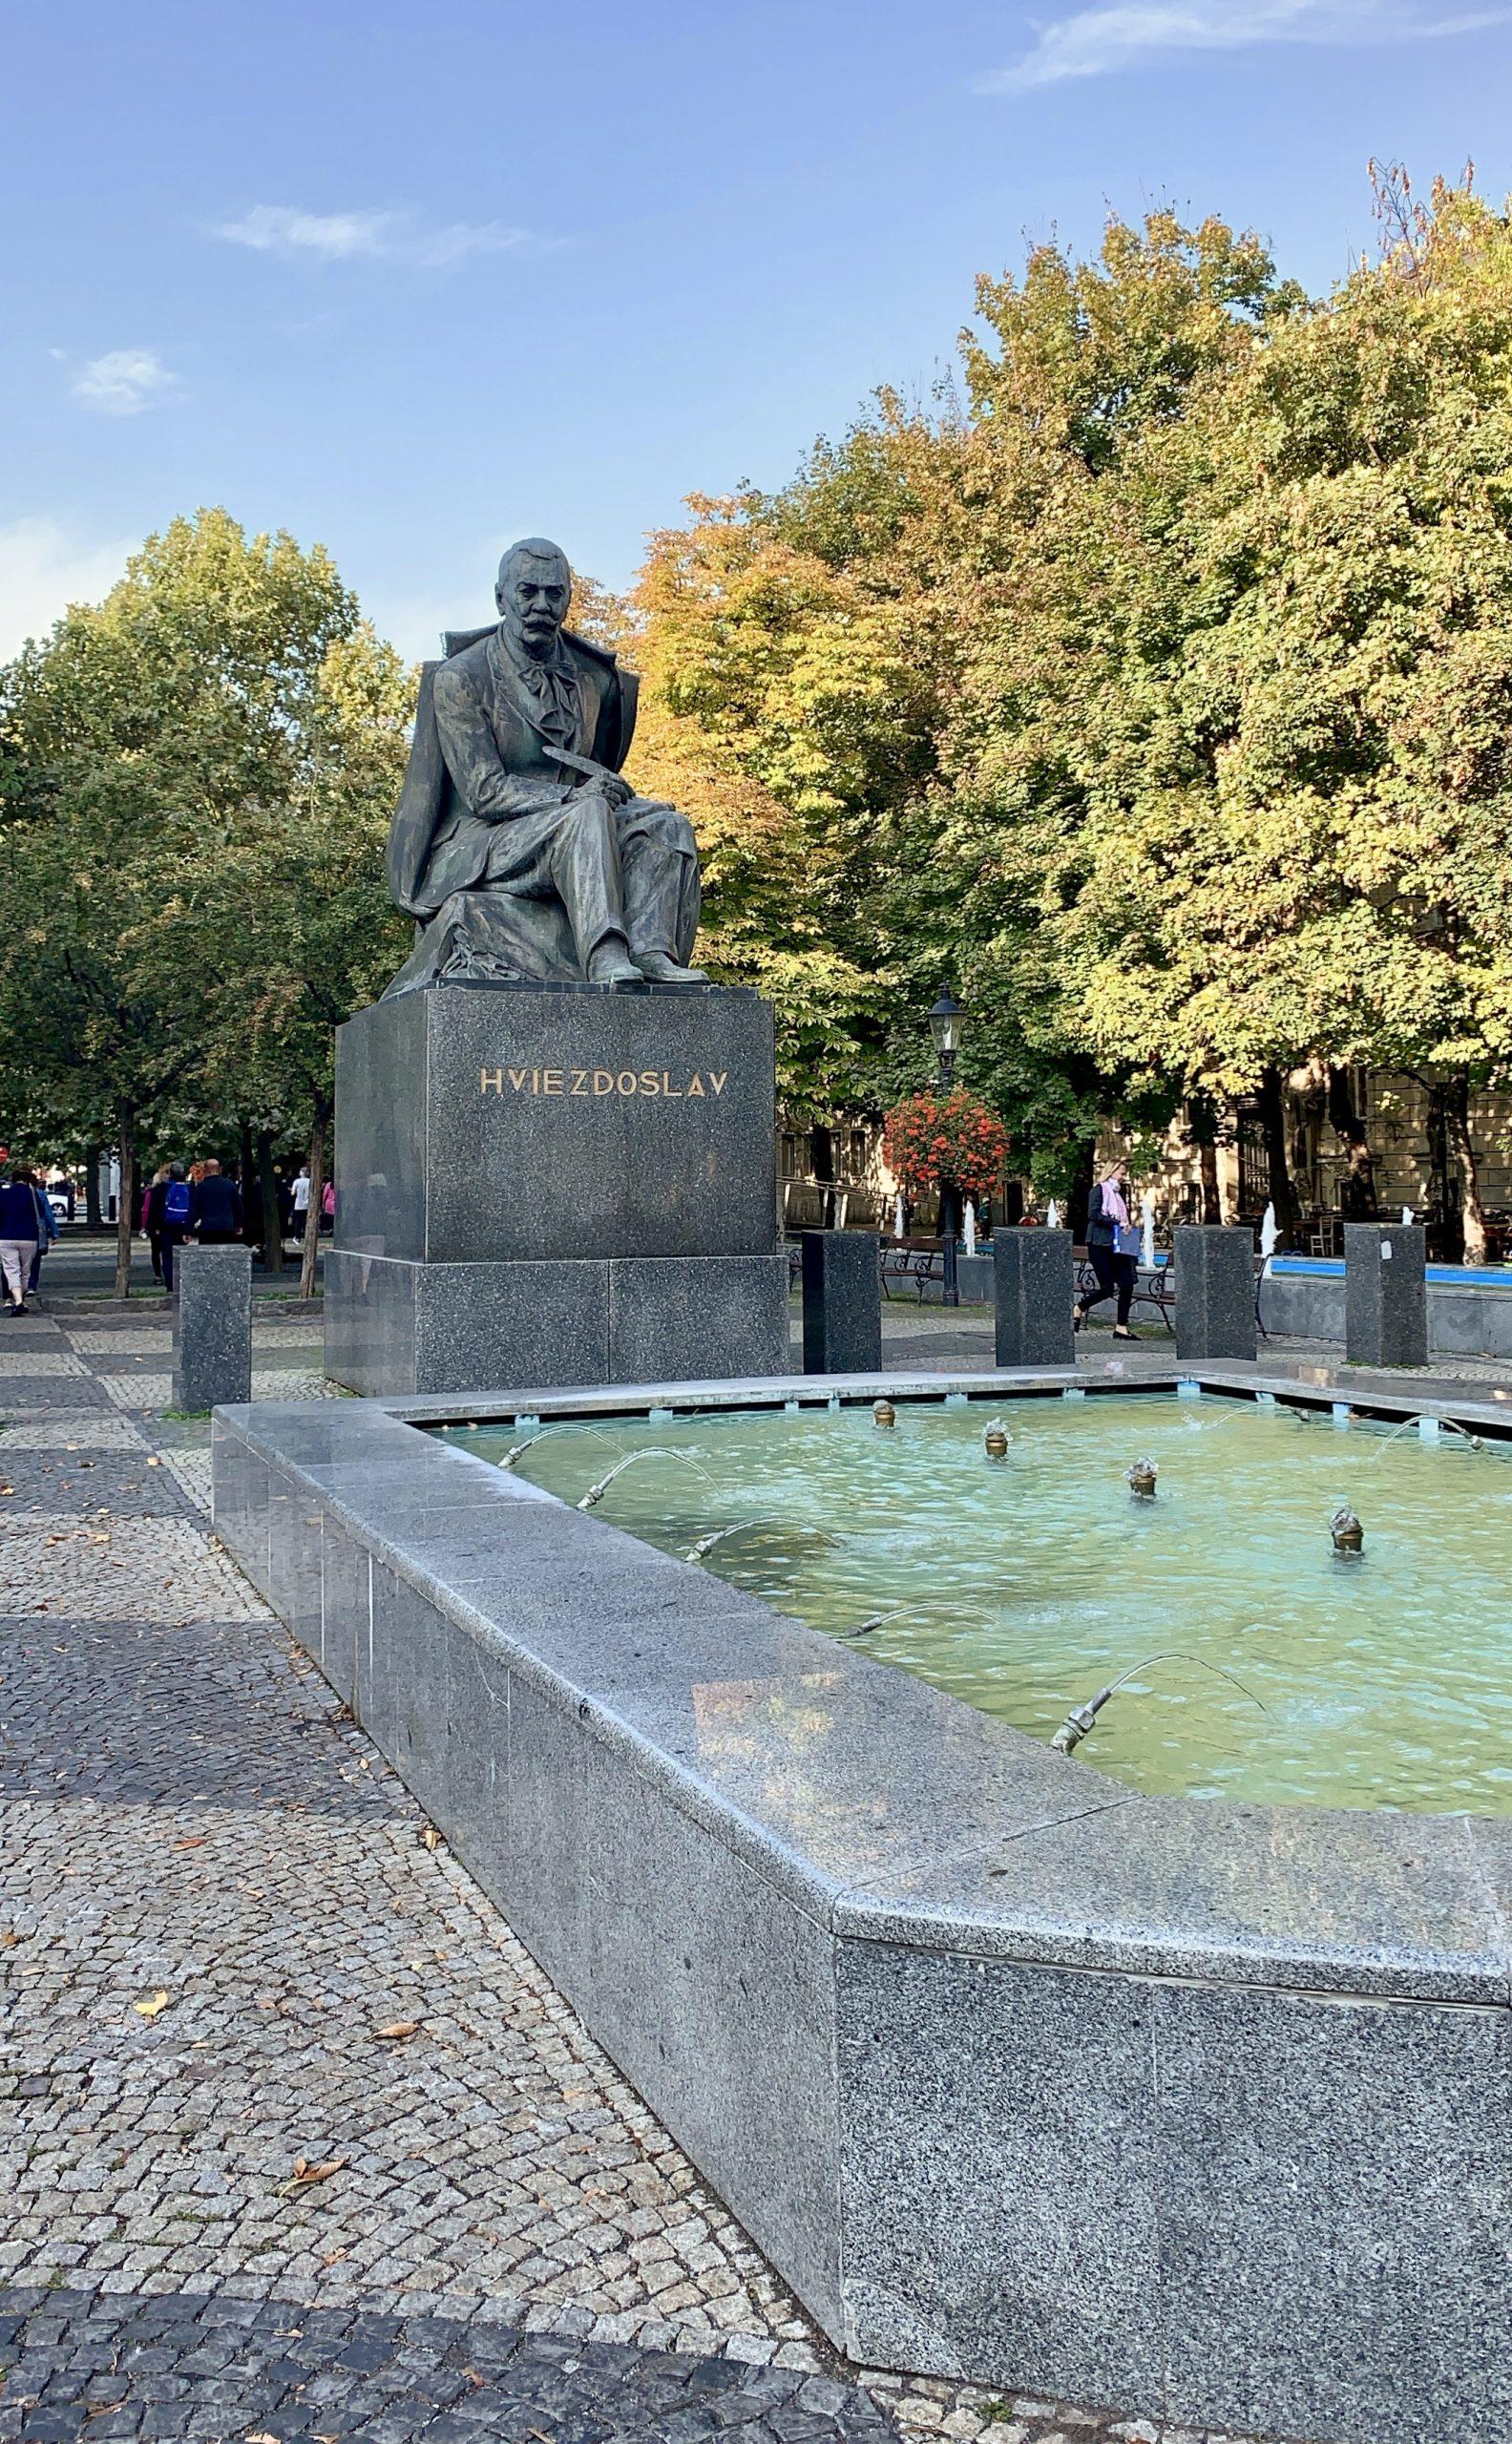 Hviezdoslav statue